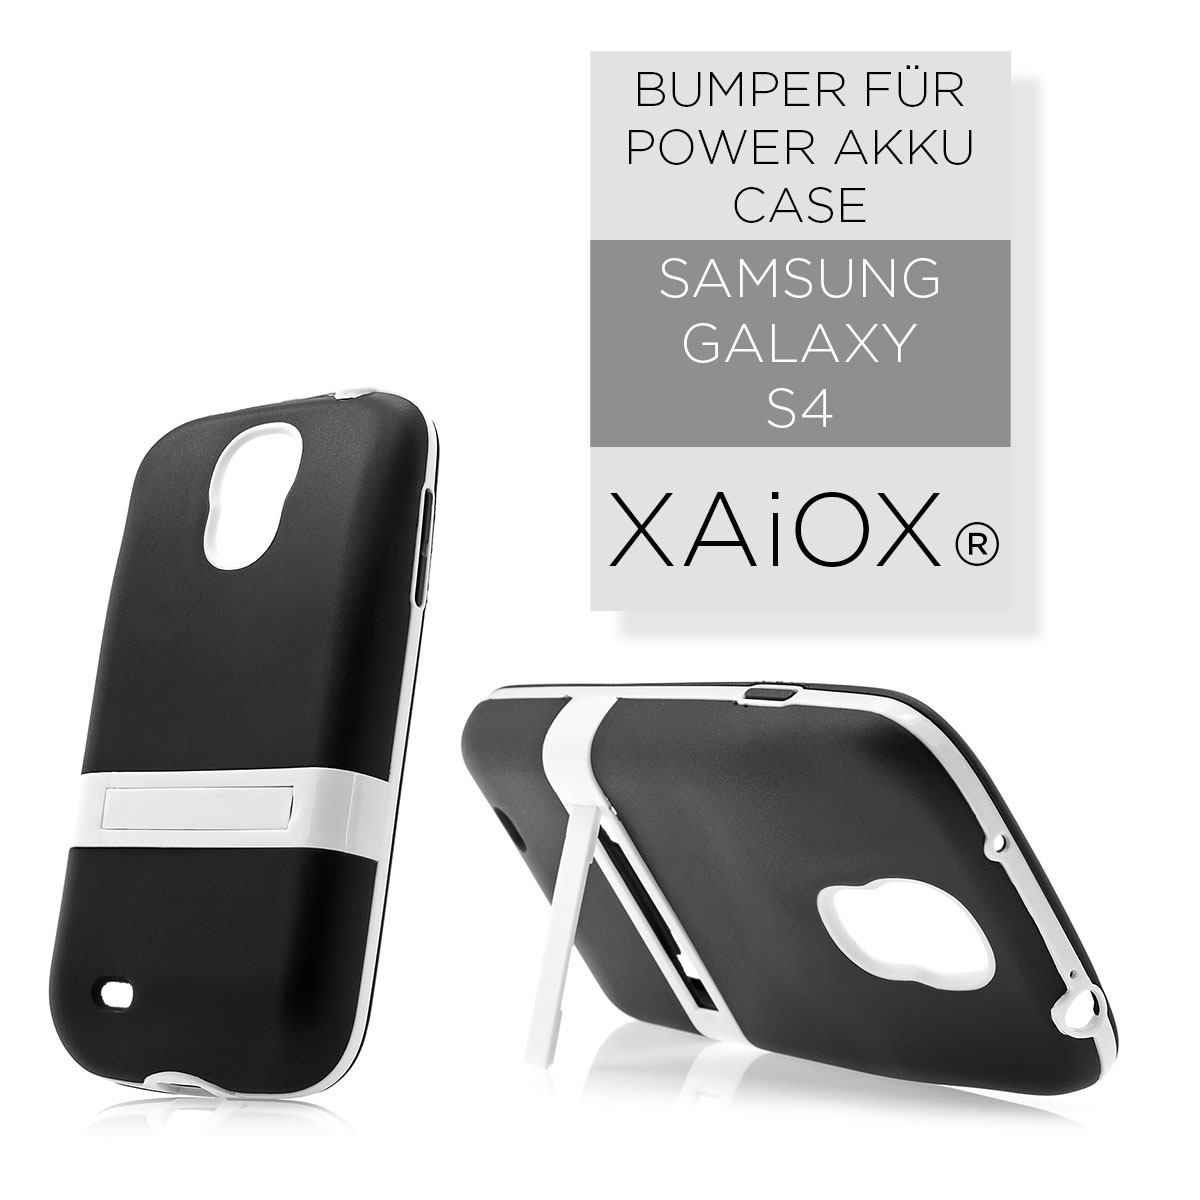 Samsung-Galaxy-S4-i9500-i9505-Backcover-fuer-Power-Akku-Deckel-Case-schwarz